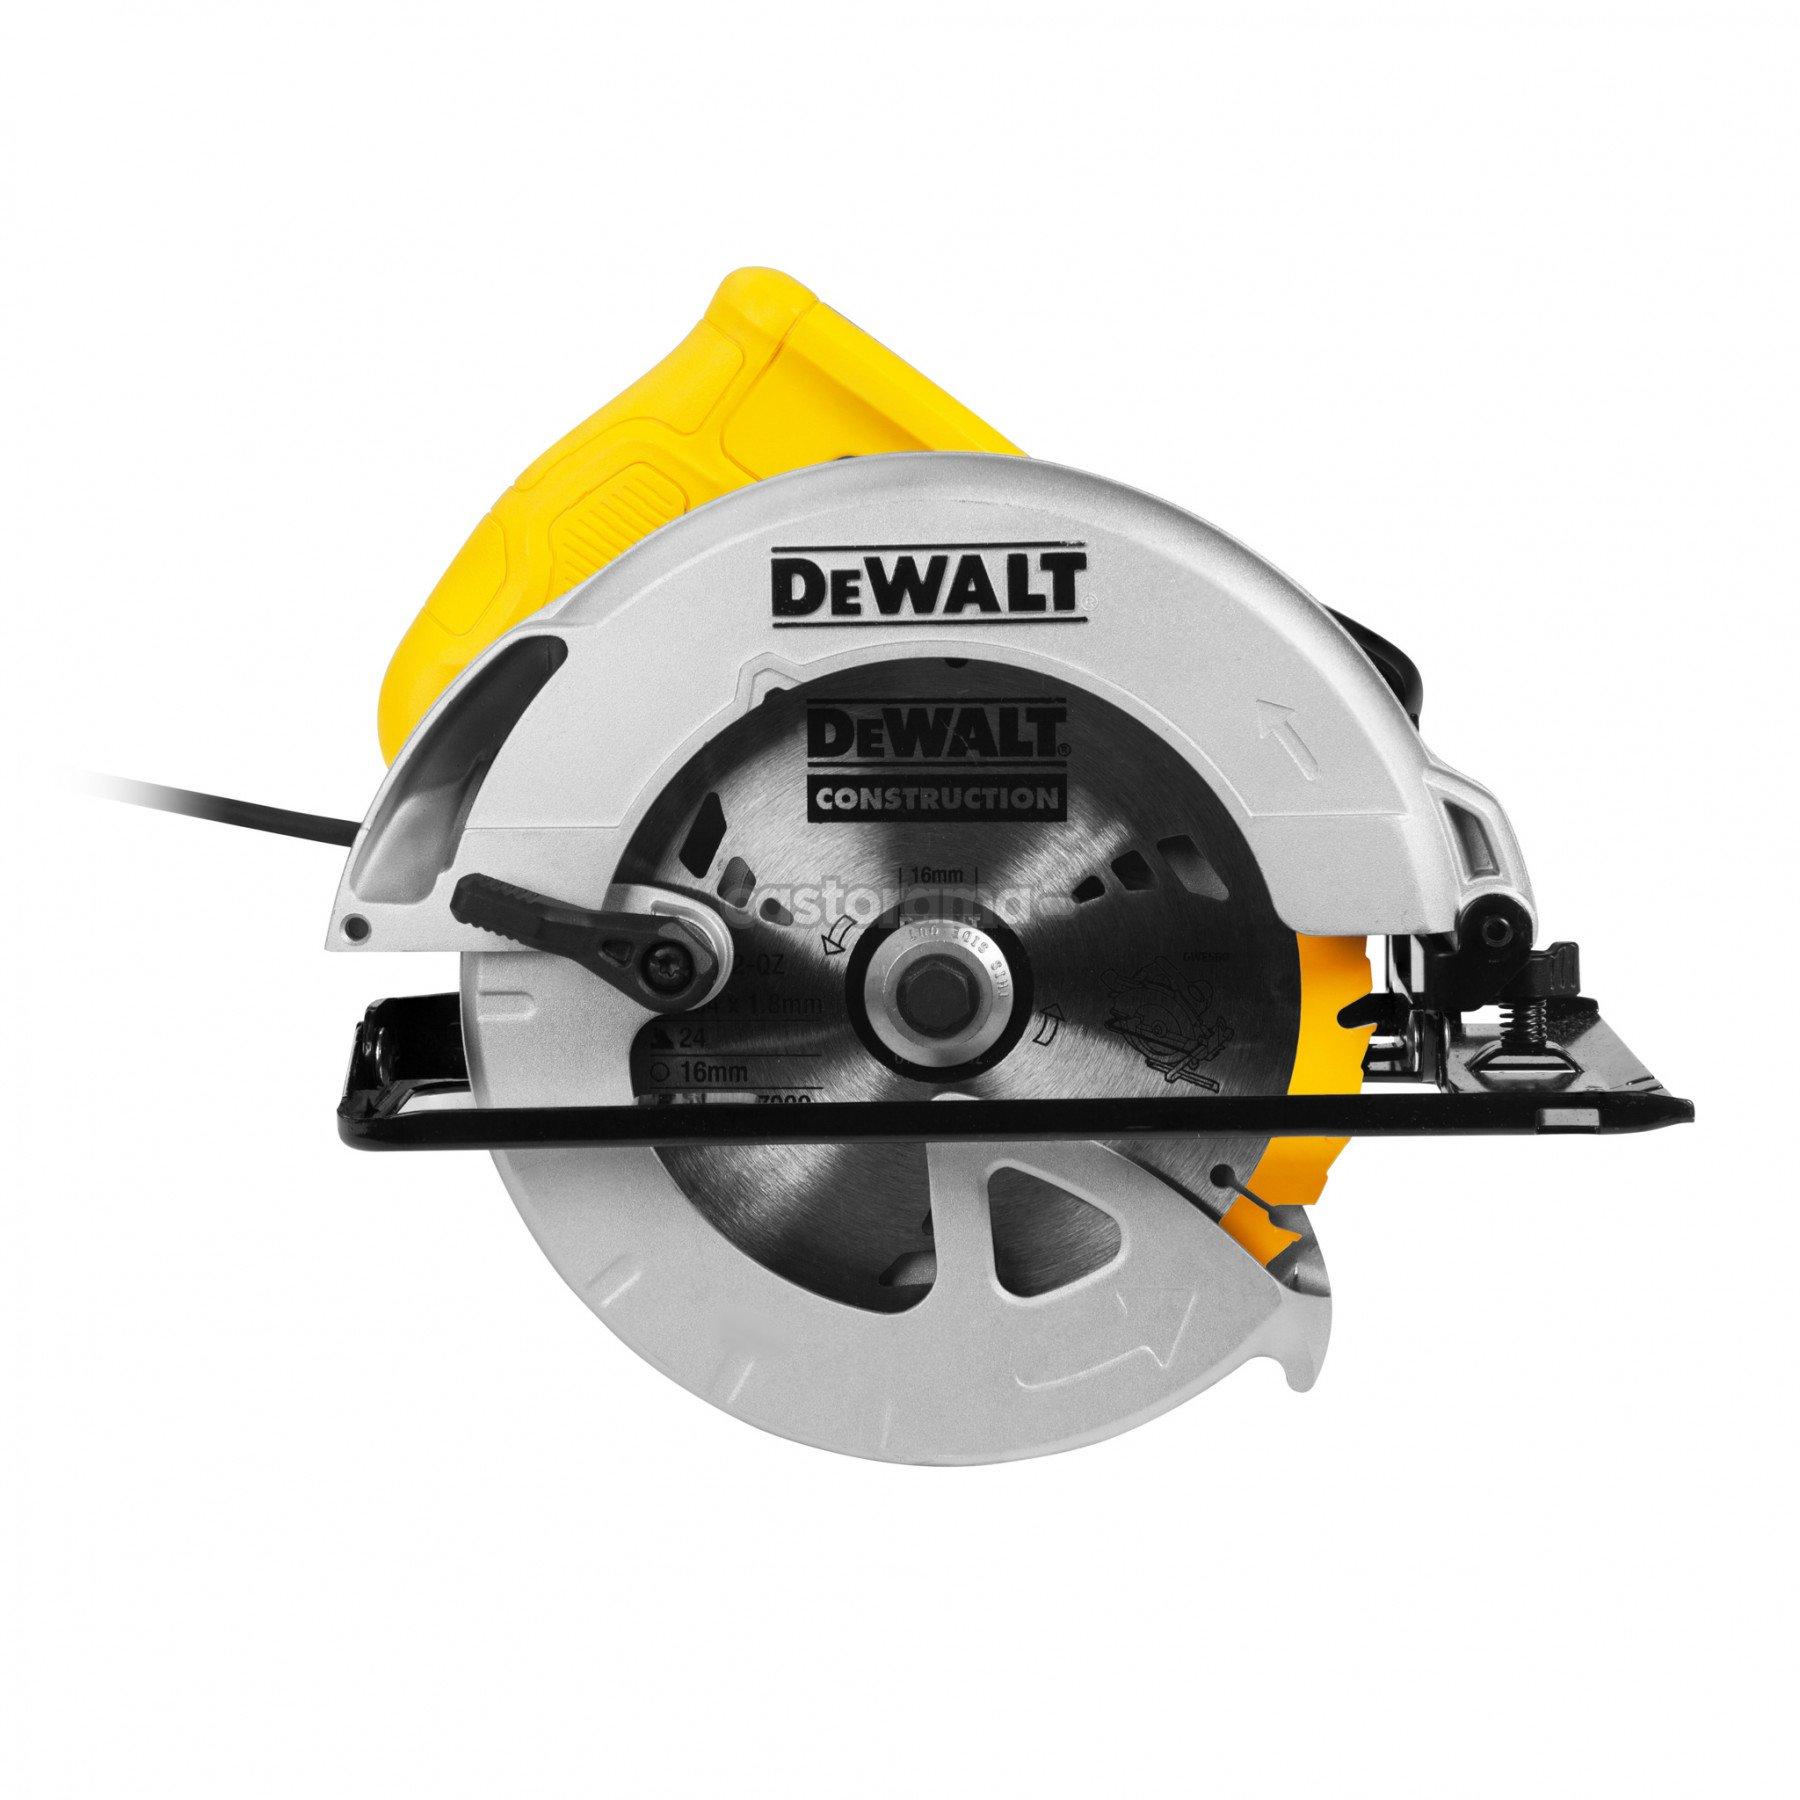 اره گرد بر دیوالت(DeWalt)مدلDWE560